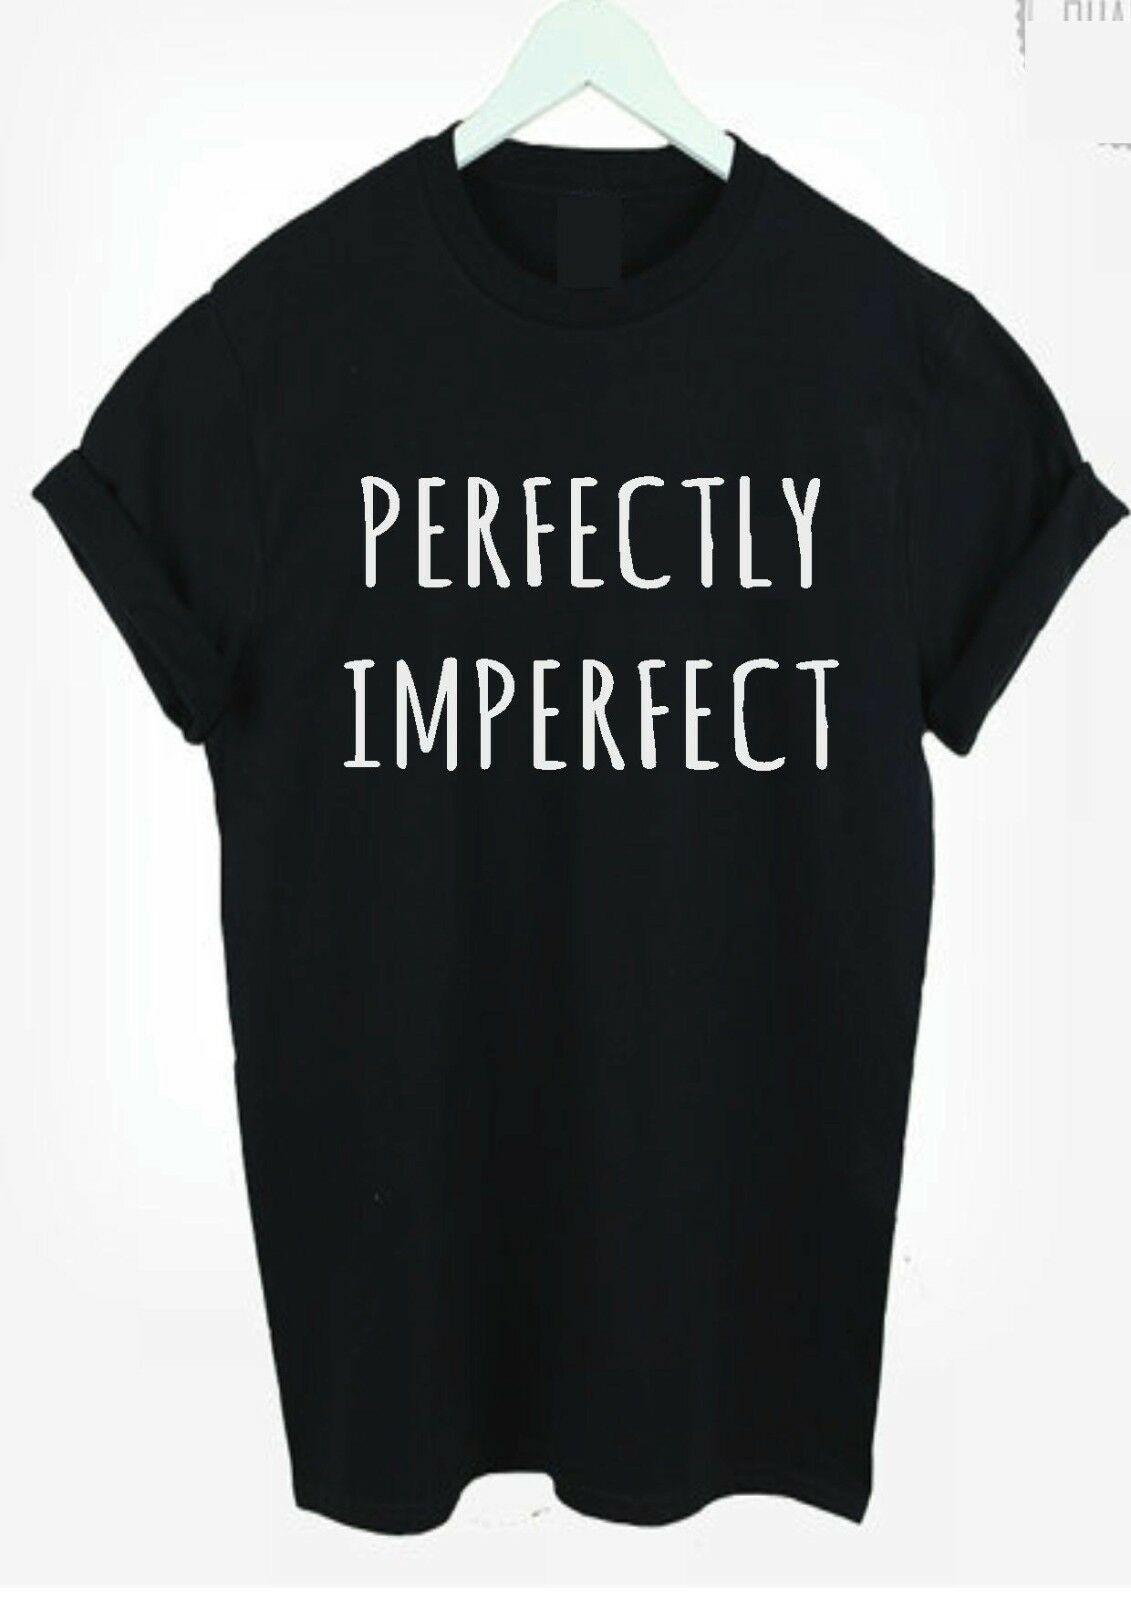 eb2625001a61 Perfectly Imperfect T Shirt Top Tumblr Blogger Fashion Perfect Slogan Sm  Xxxl Gift Print T Shirt